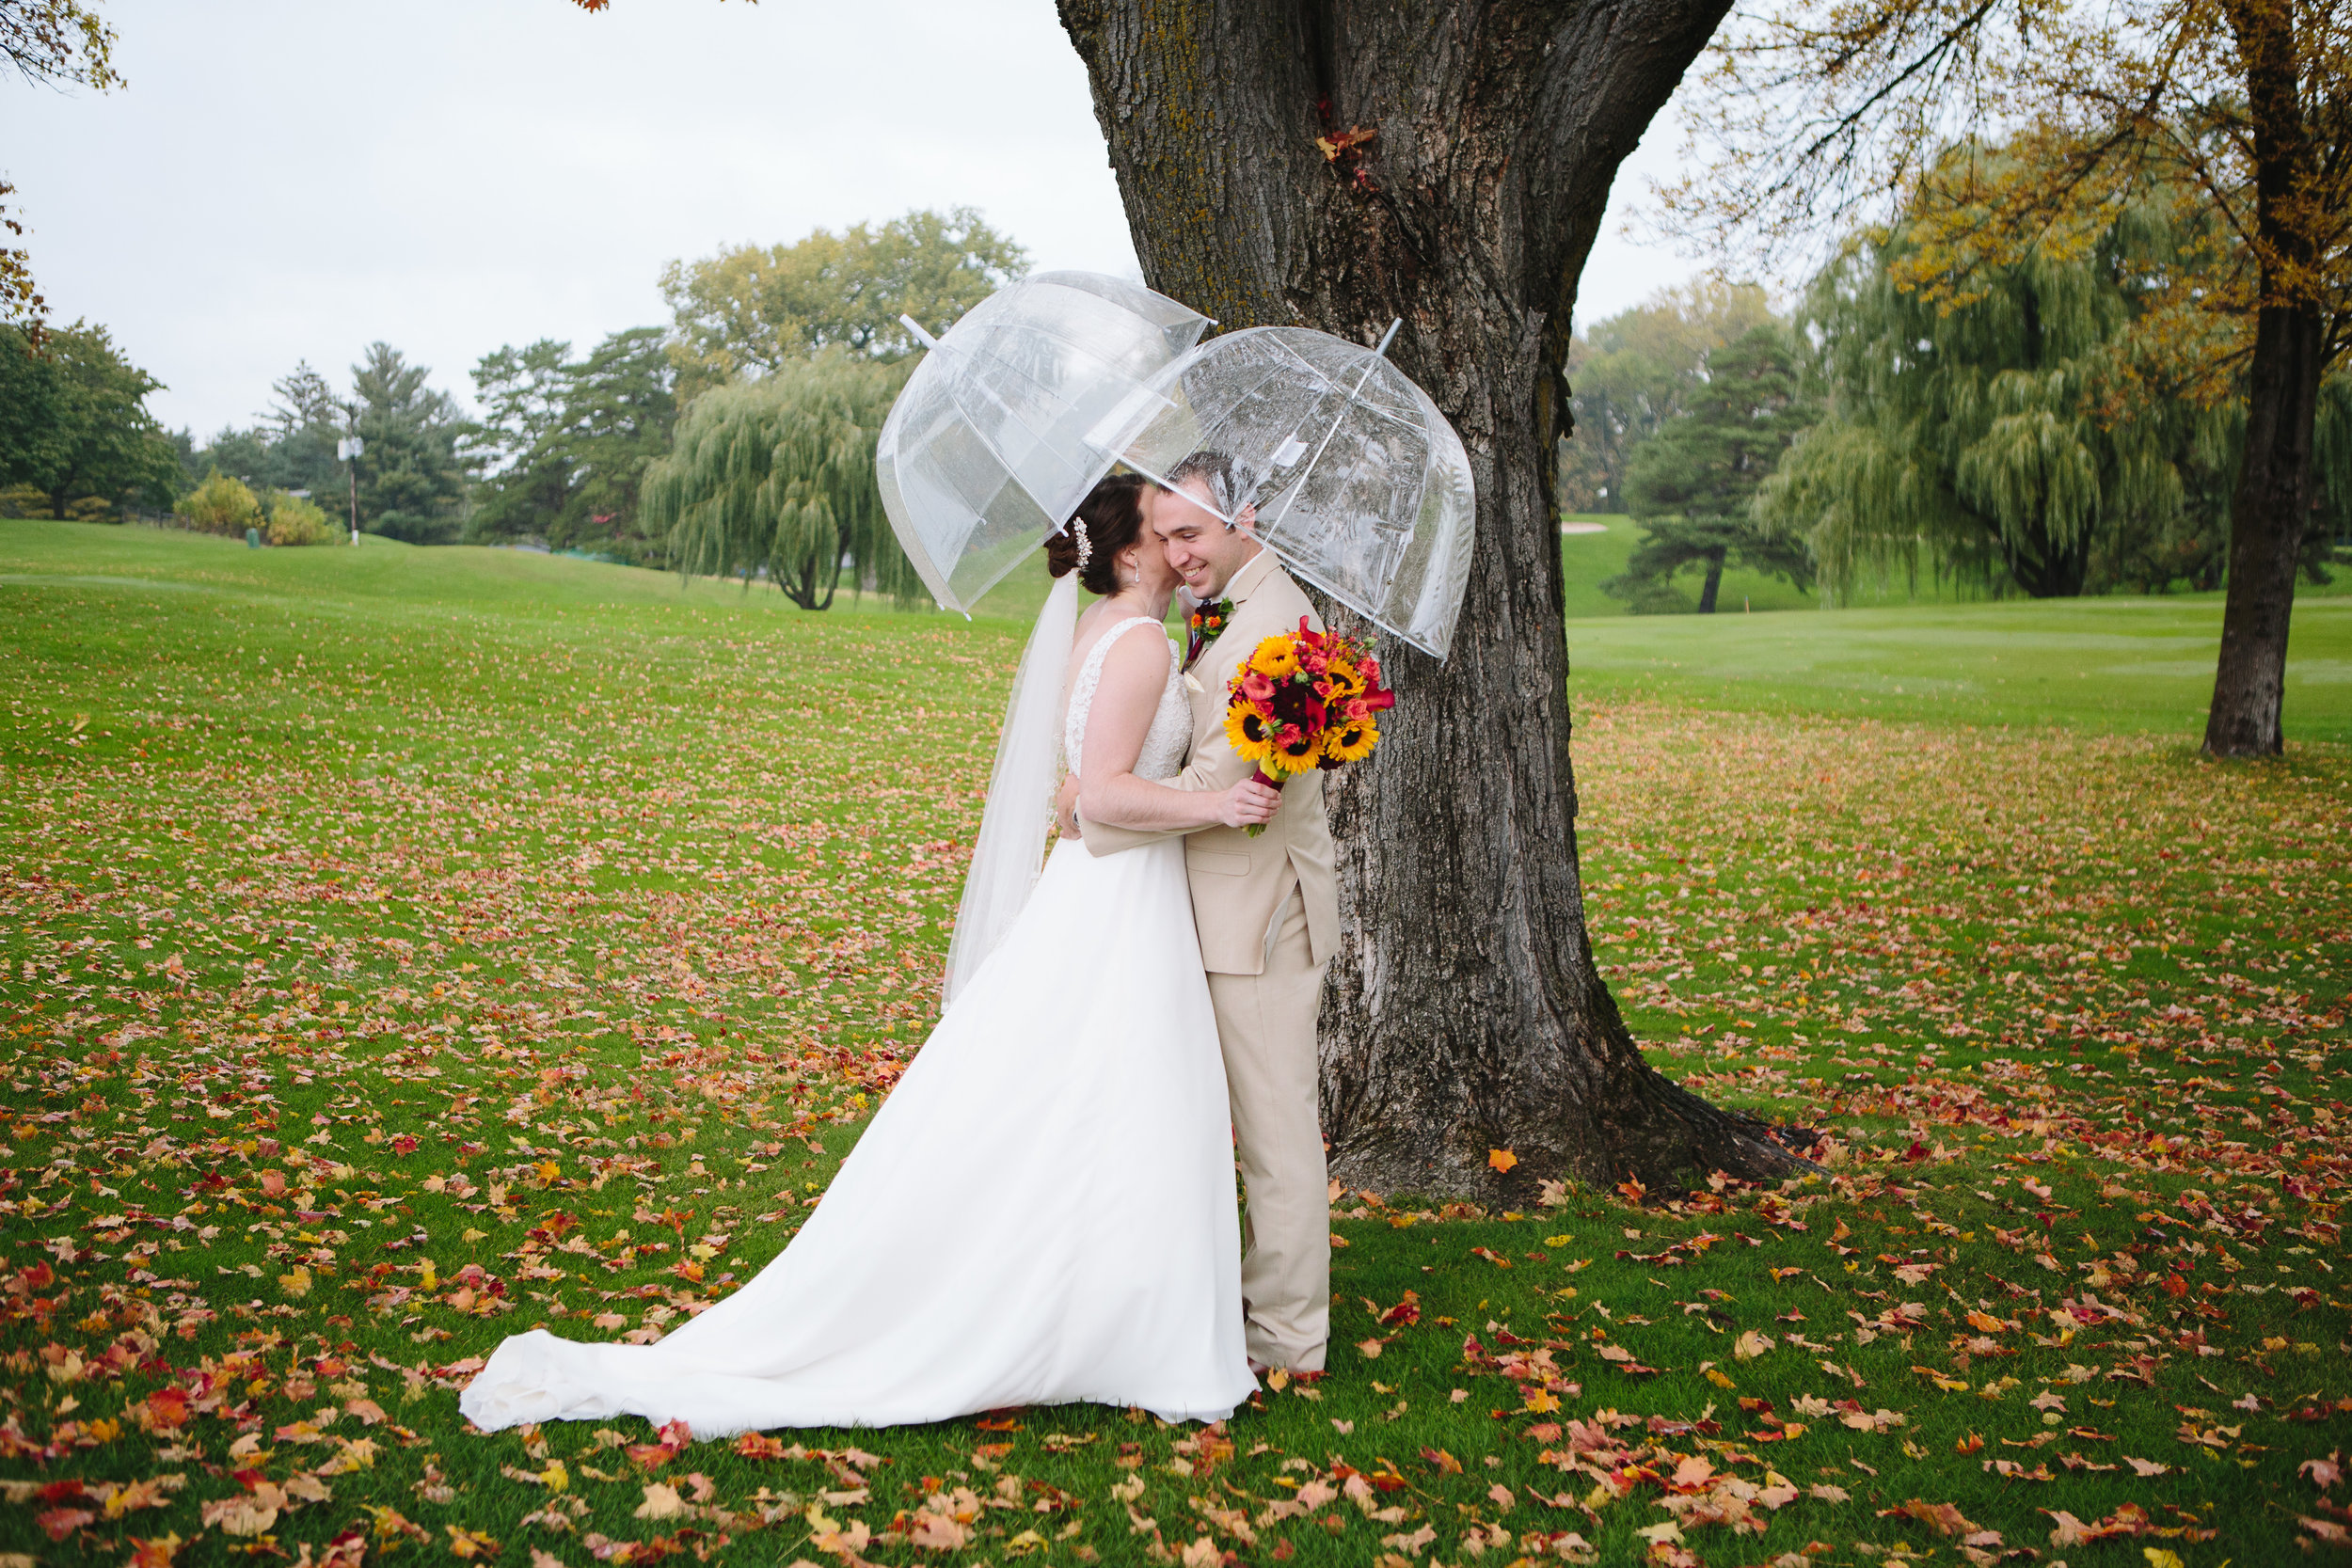 Lauren Baker Photography in case of rain on wedding hair